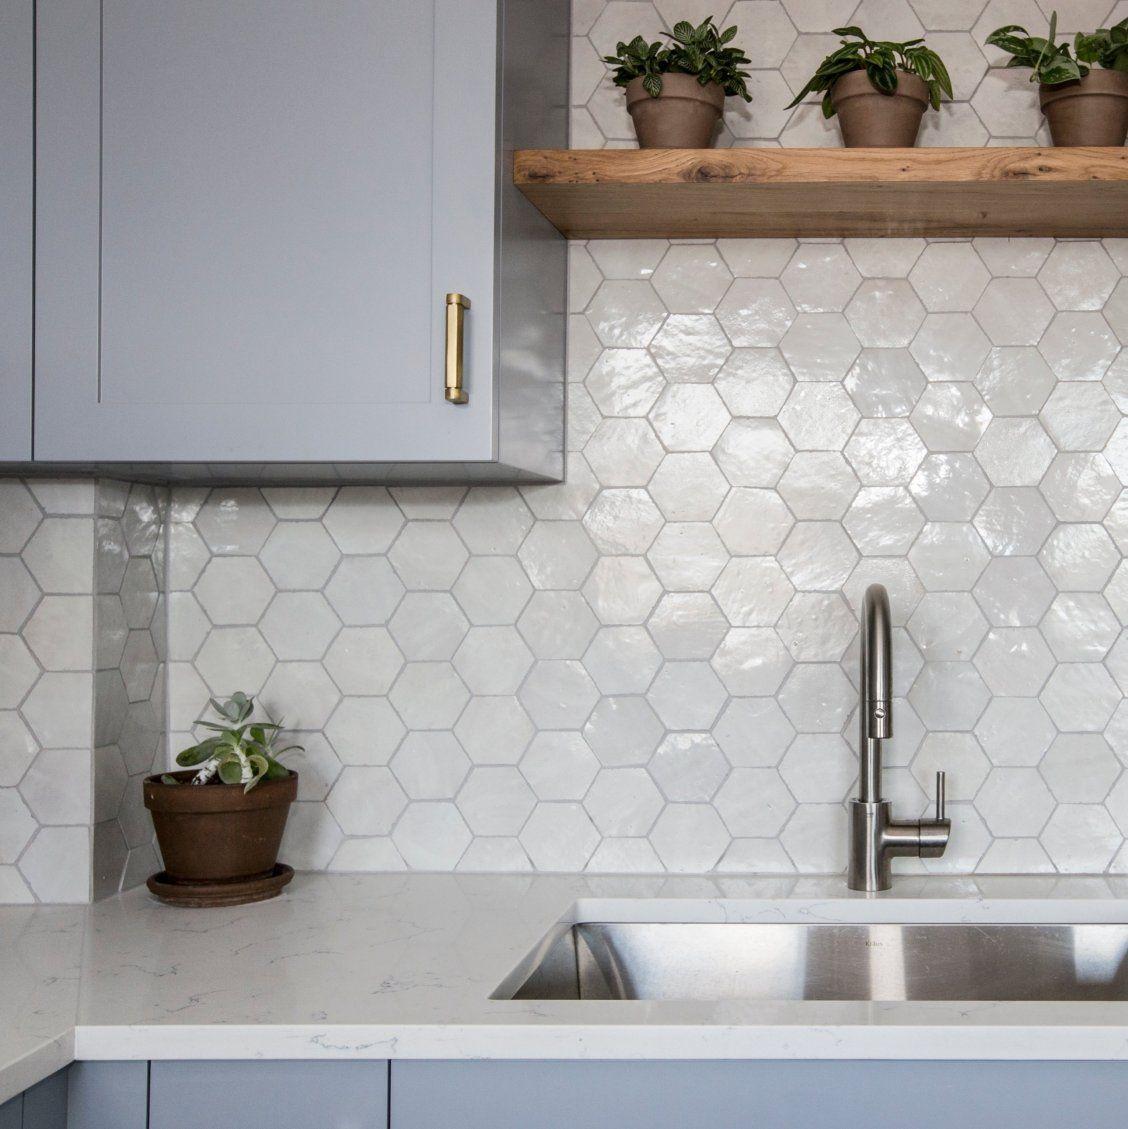 Zellige Weathered White Hex 3 1 2 X4 X3 8 Kitchen Backsplash Trends Kitchen Backsplash Designs White Kitchen Backsplash